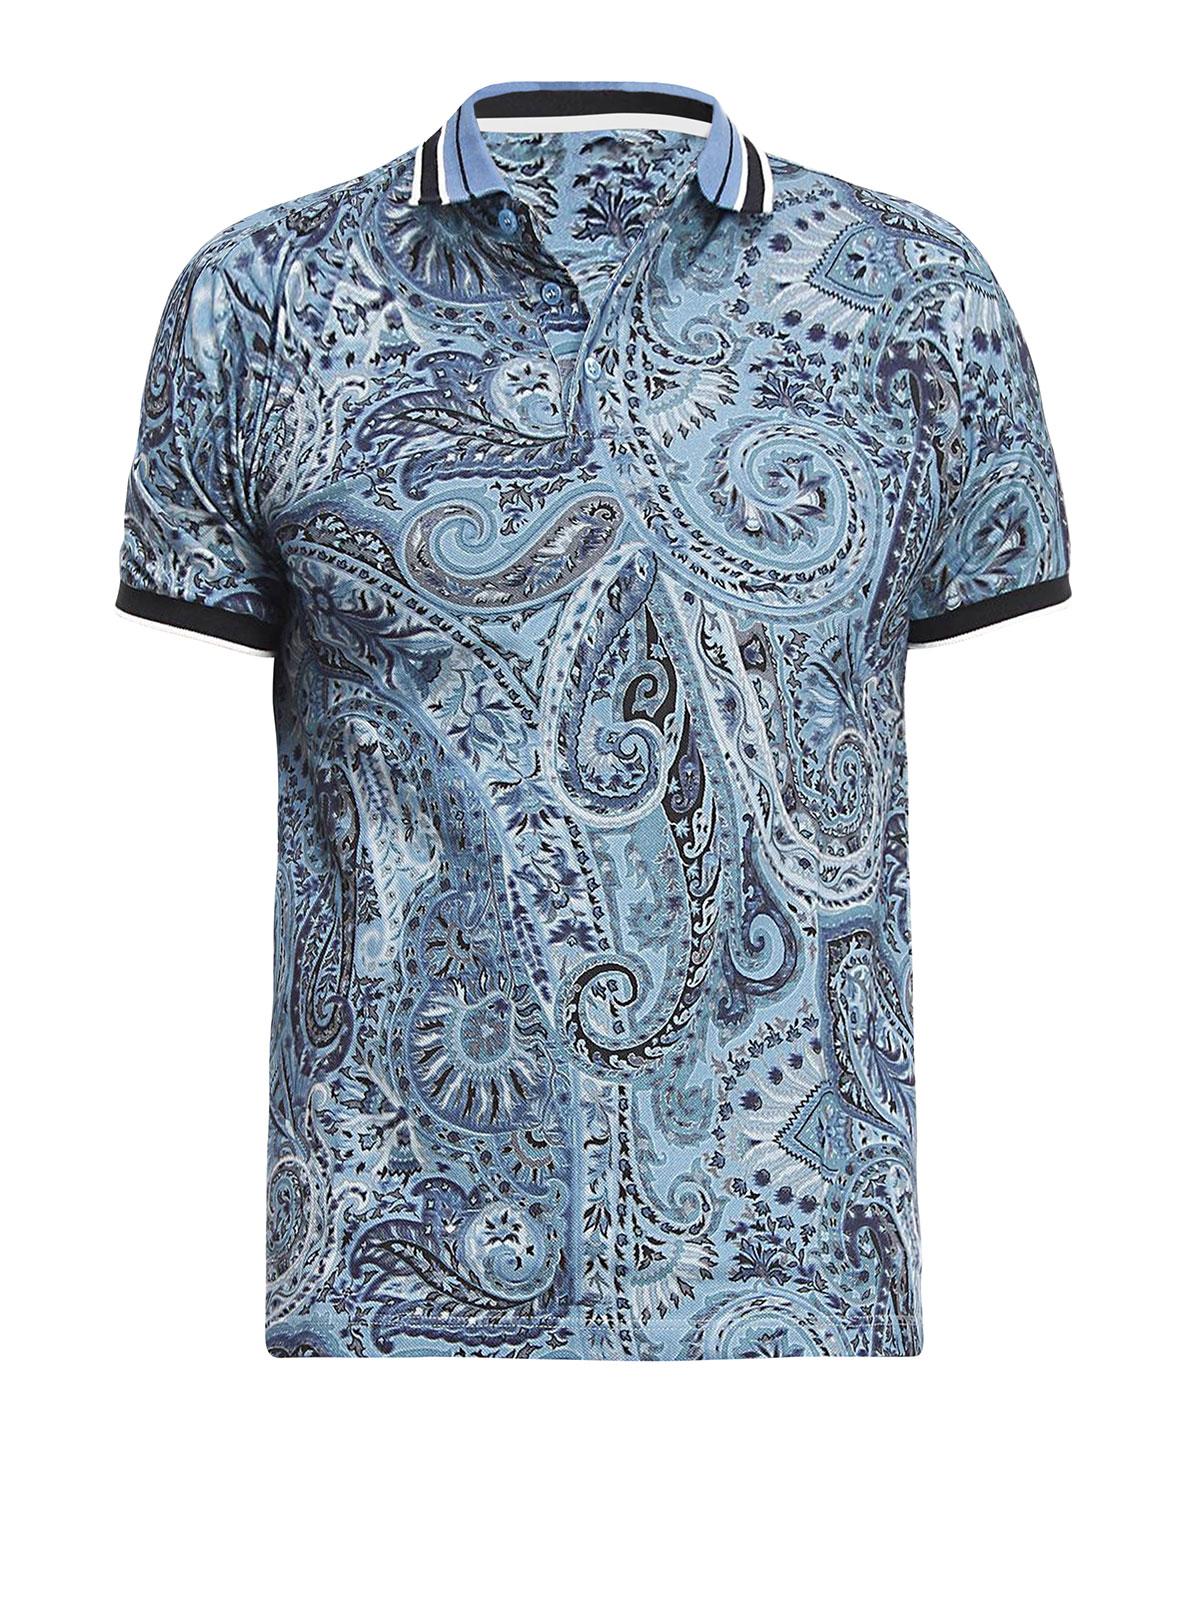 Paisley polo shirt by etro polo shirts ikrix for Etro men s shirts